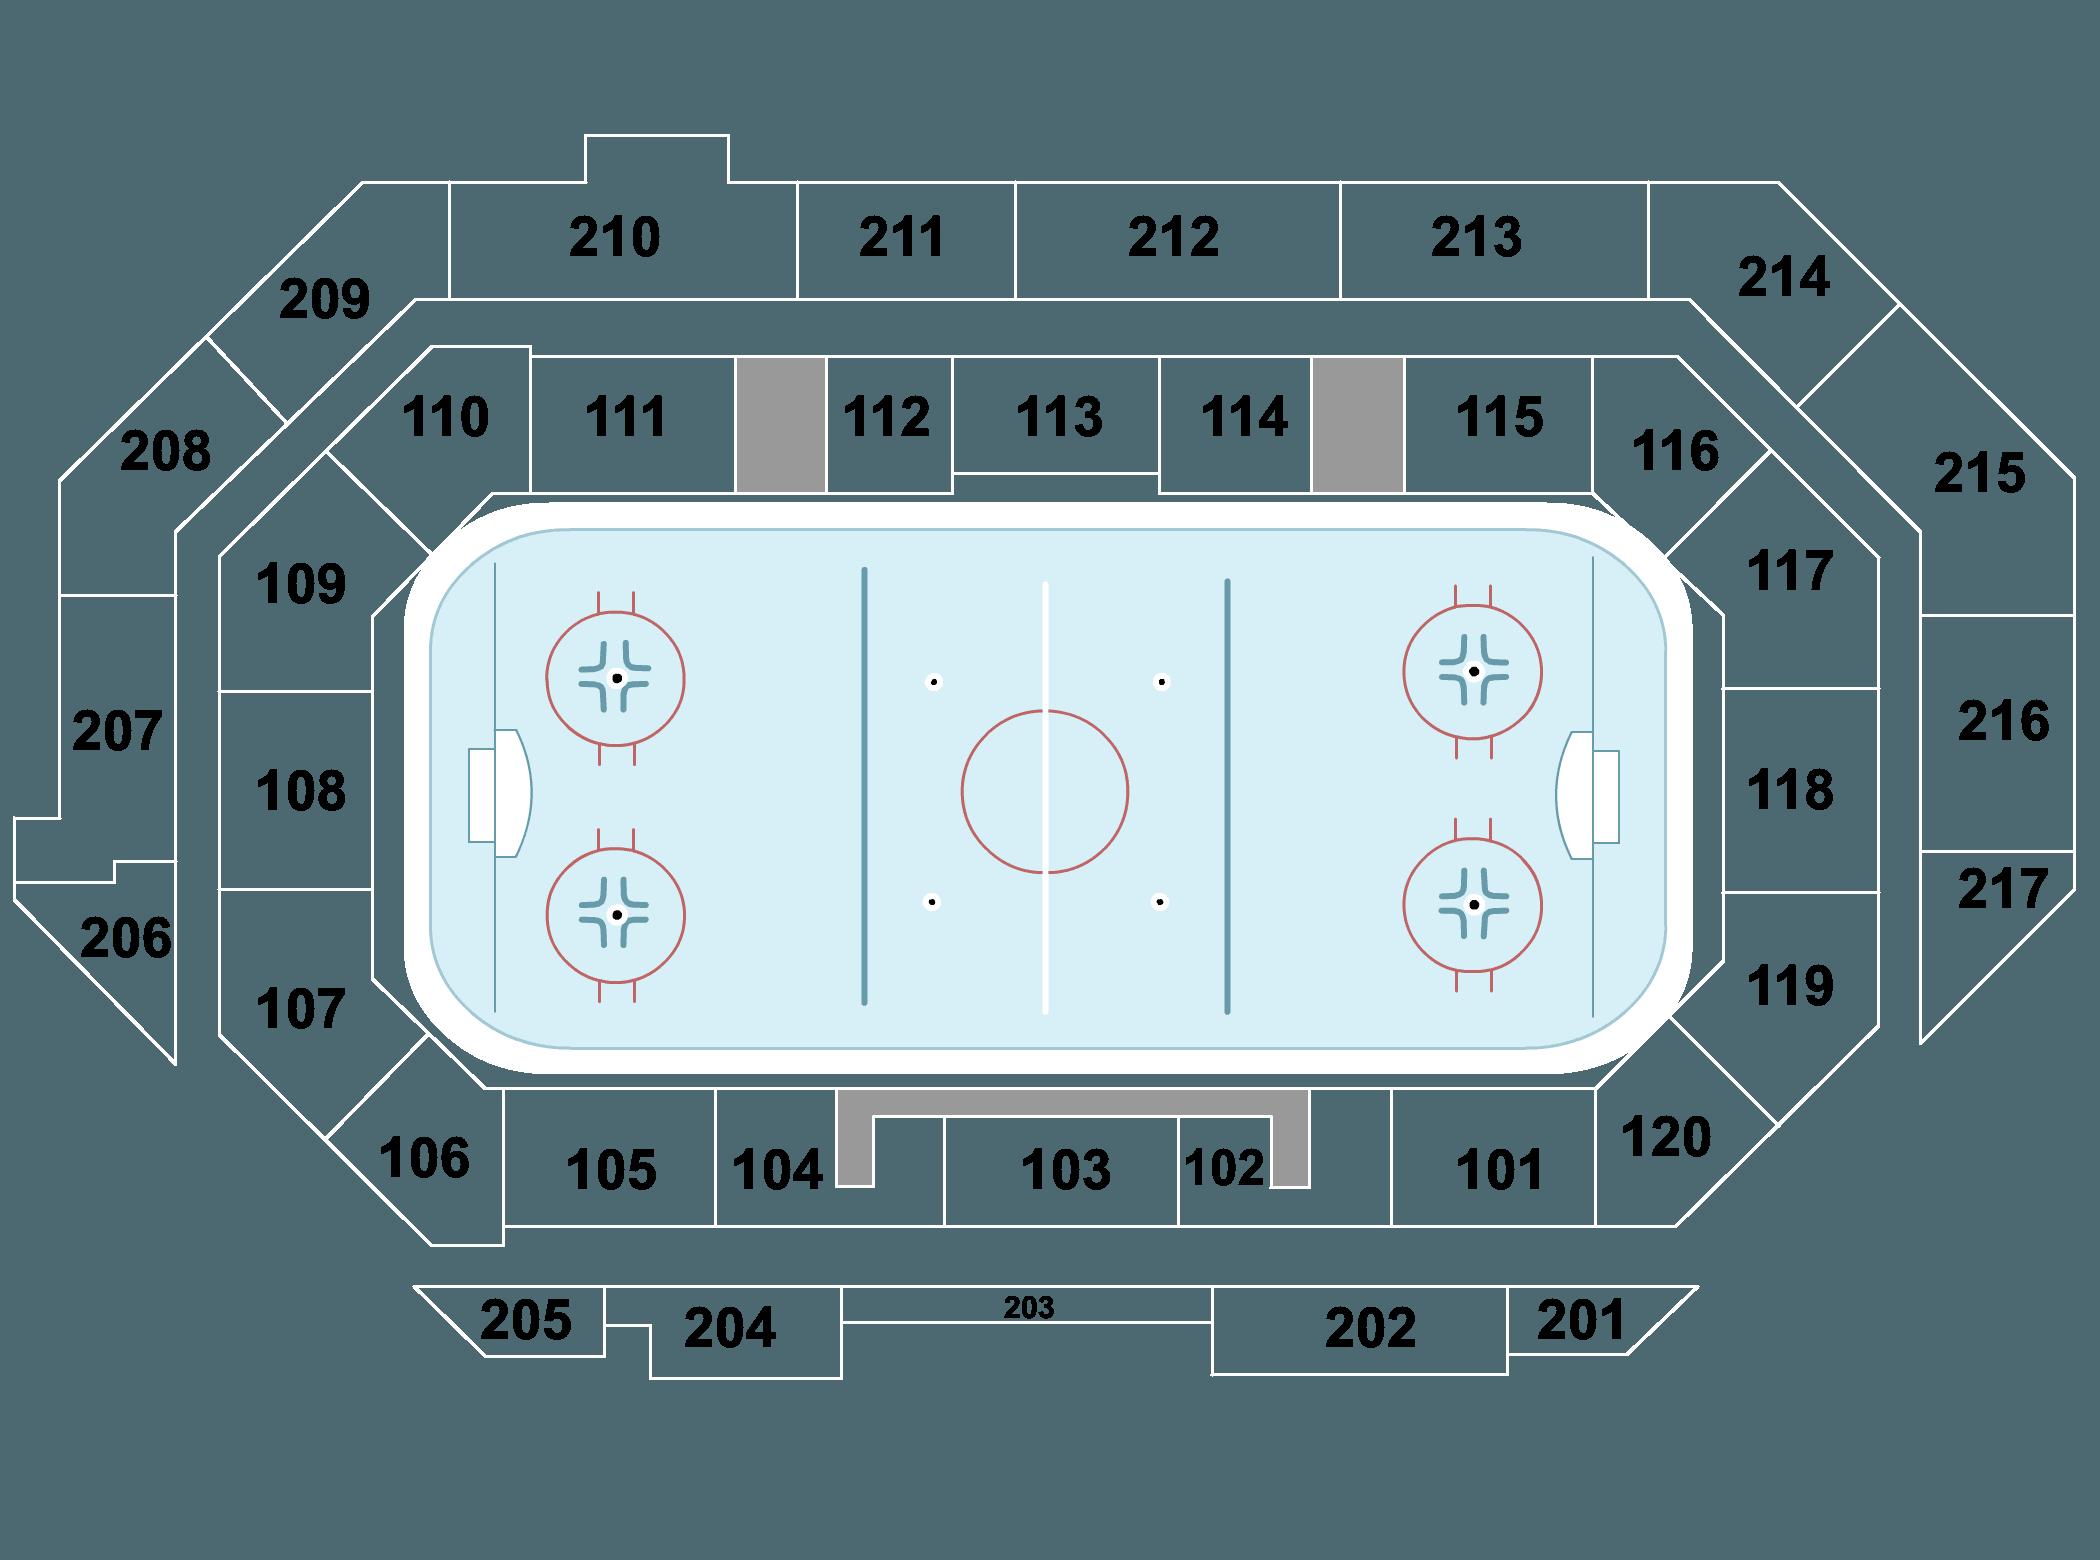 Idaho Steelheads Vs Wichita Thunder Tickets At Centurylink Arena